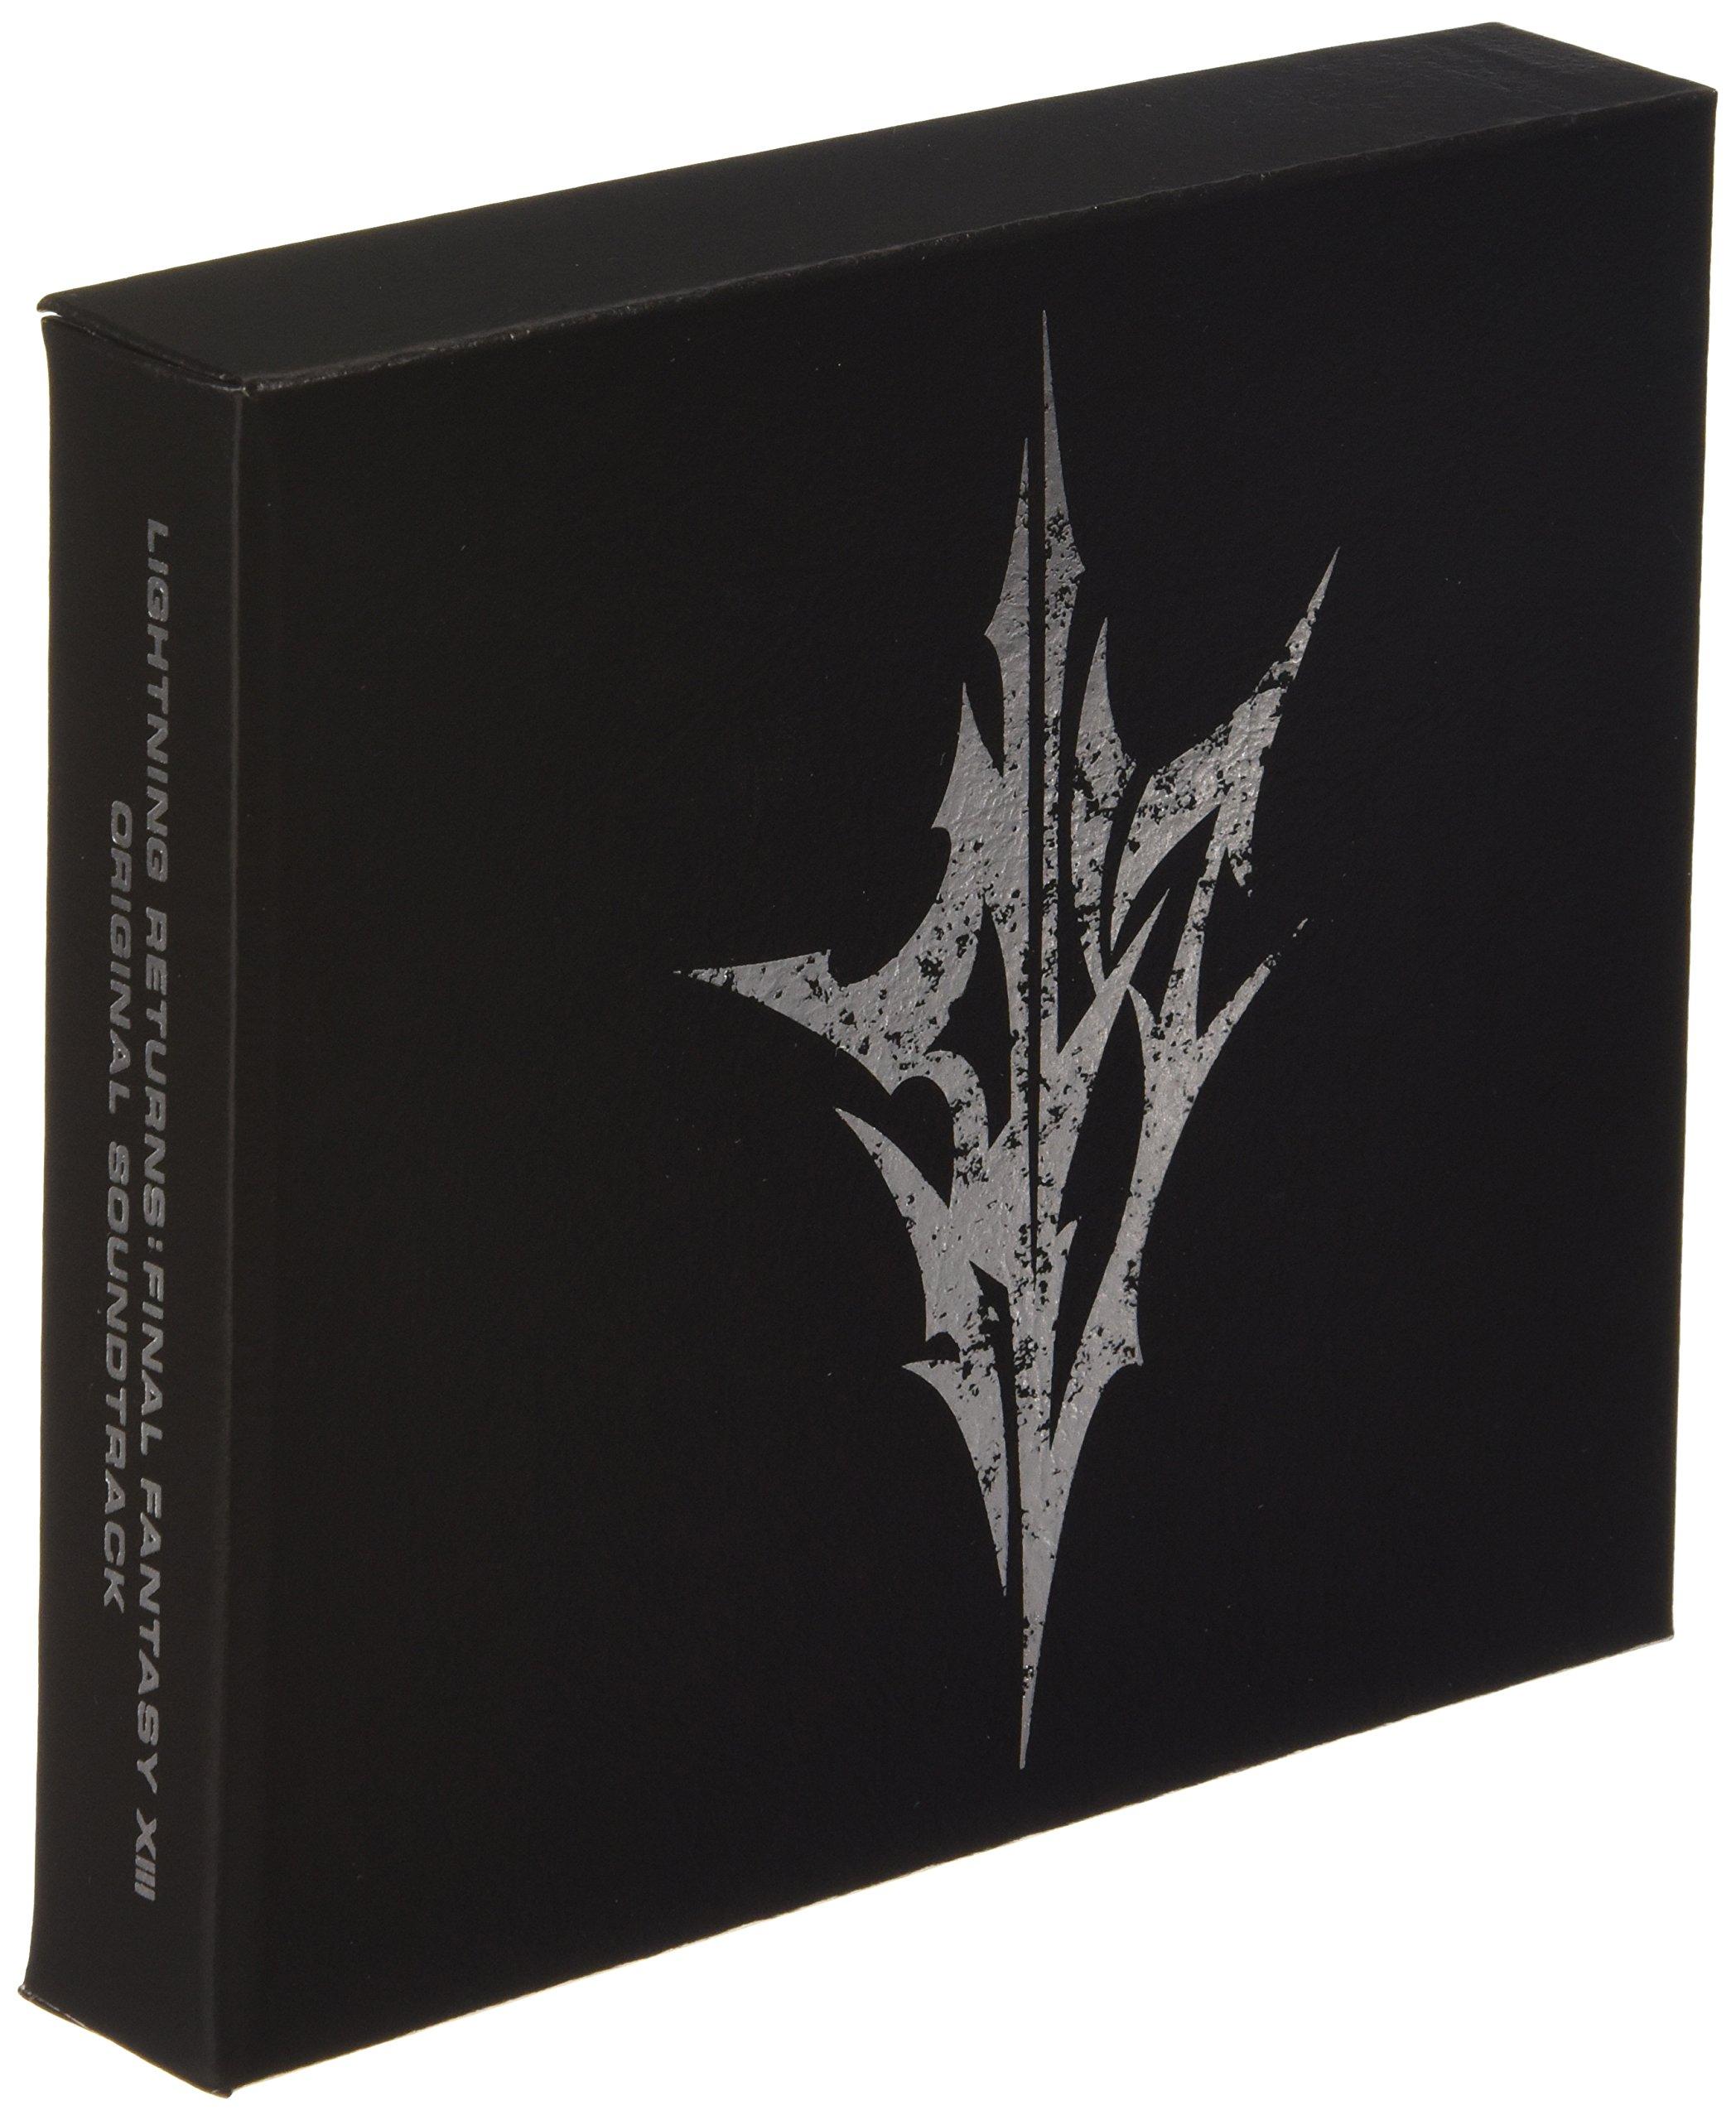 Lightning Returns:Final Fantasy XIII by Sony Japan